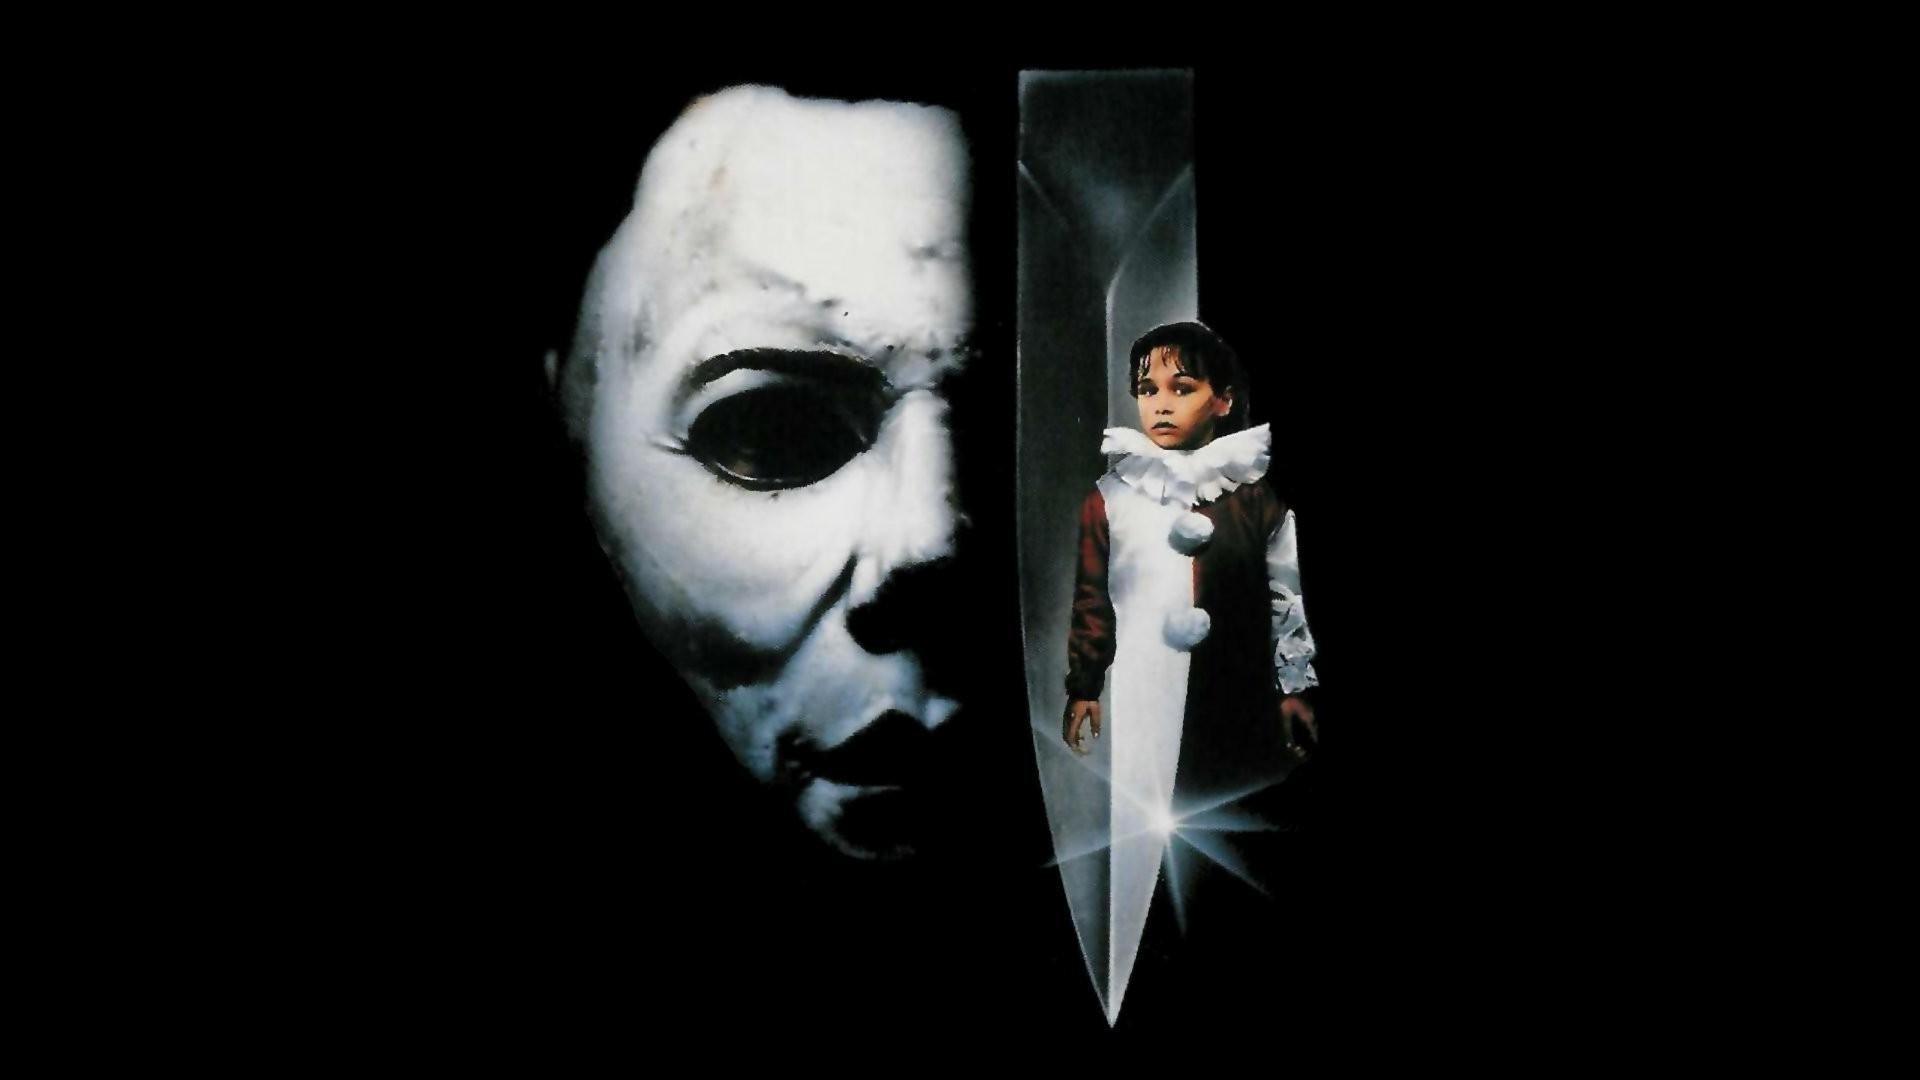 Hd Michael Myers Halloween Wallpaper 70 Images